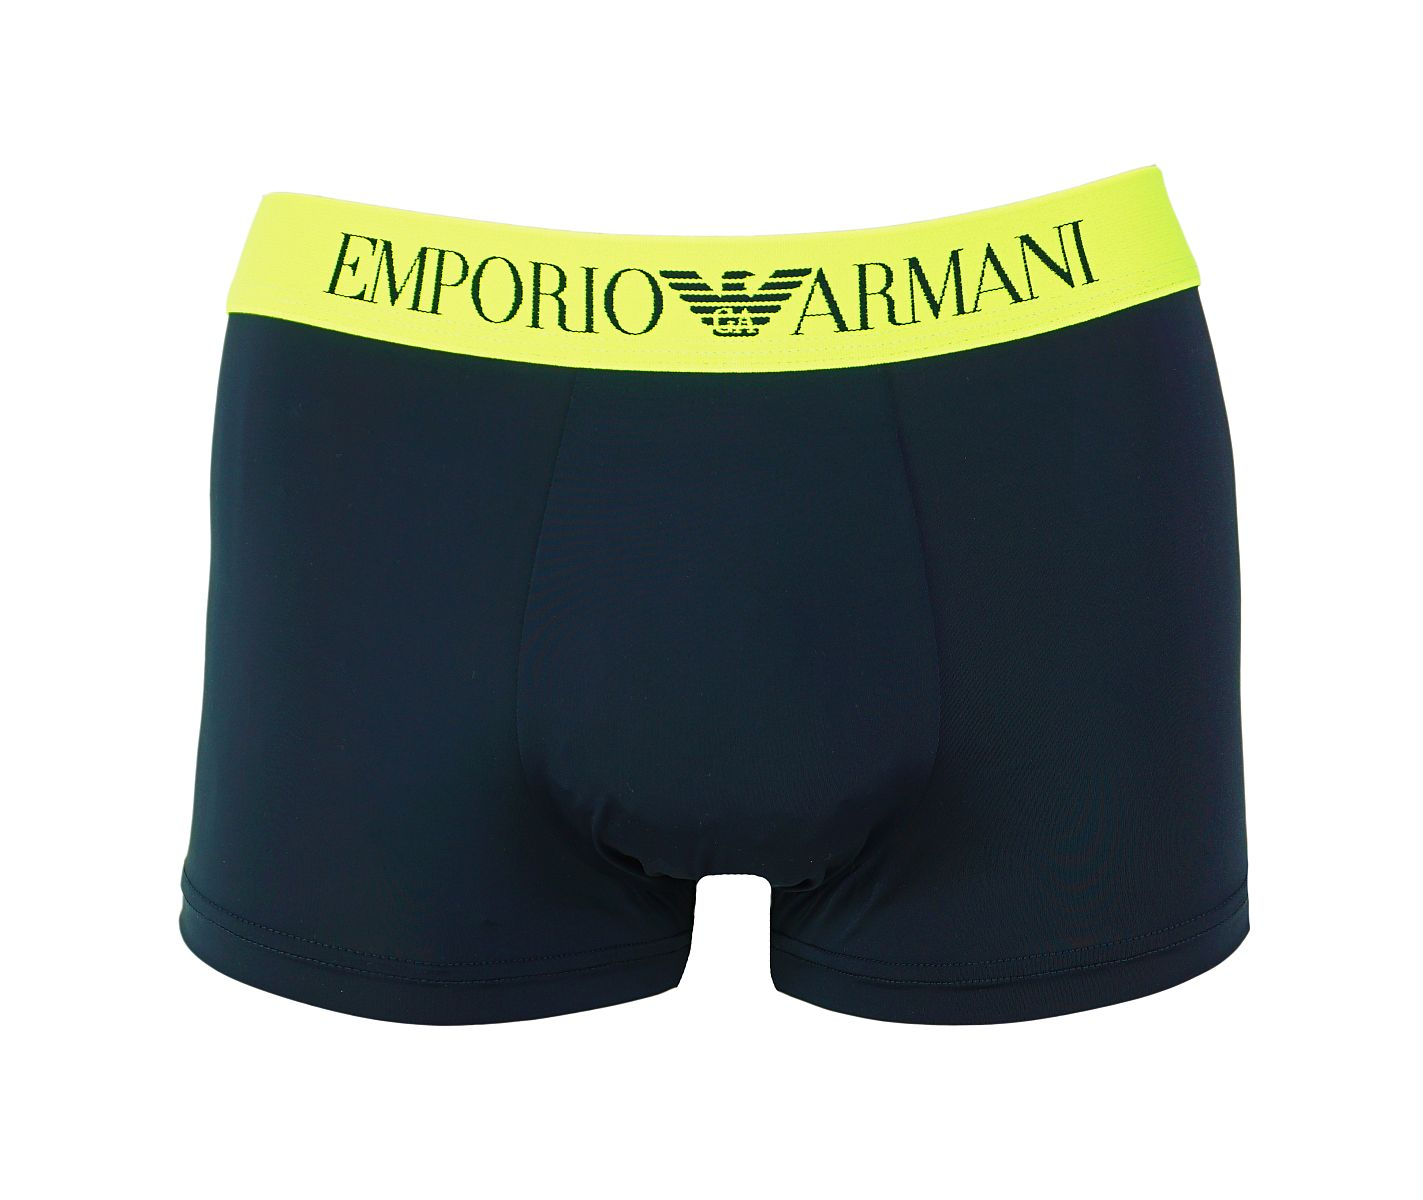 Emporio Armani Short Trunk 111290 8P515 00135 MARINE W18-EATX1